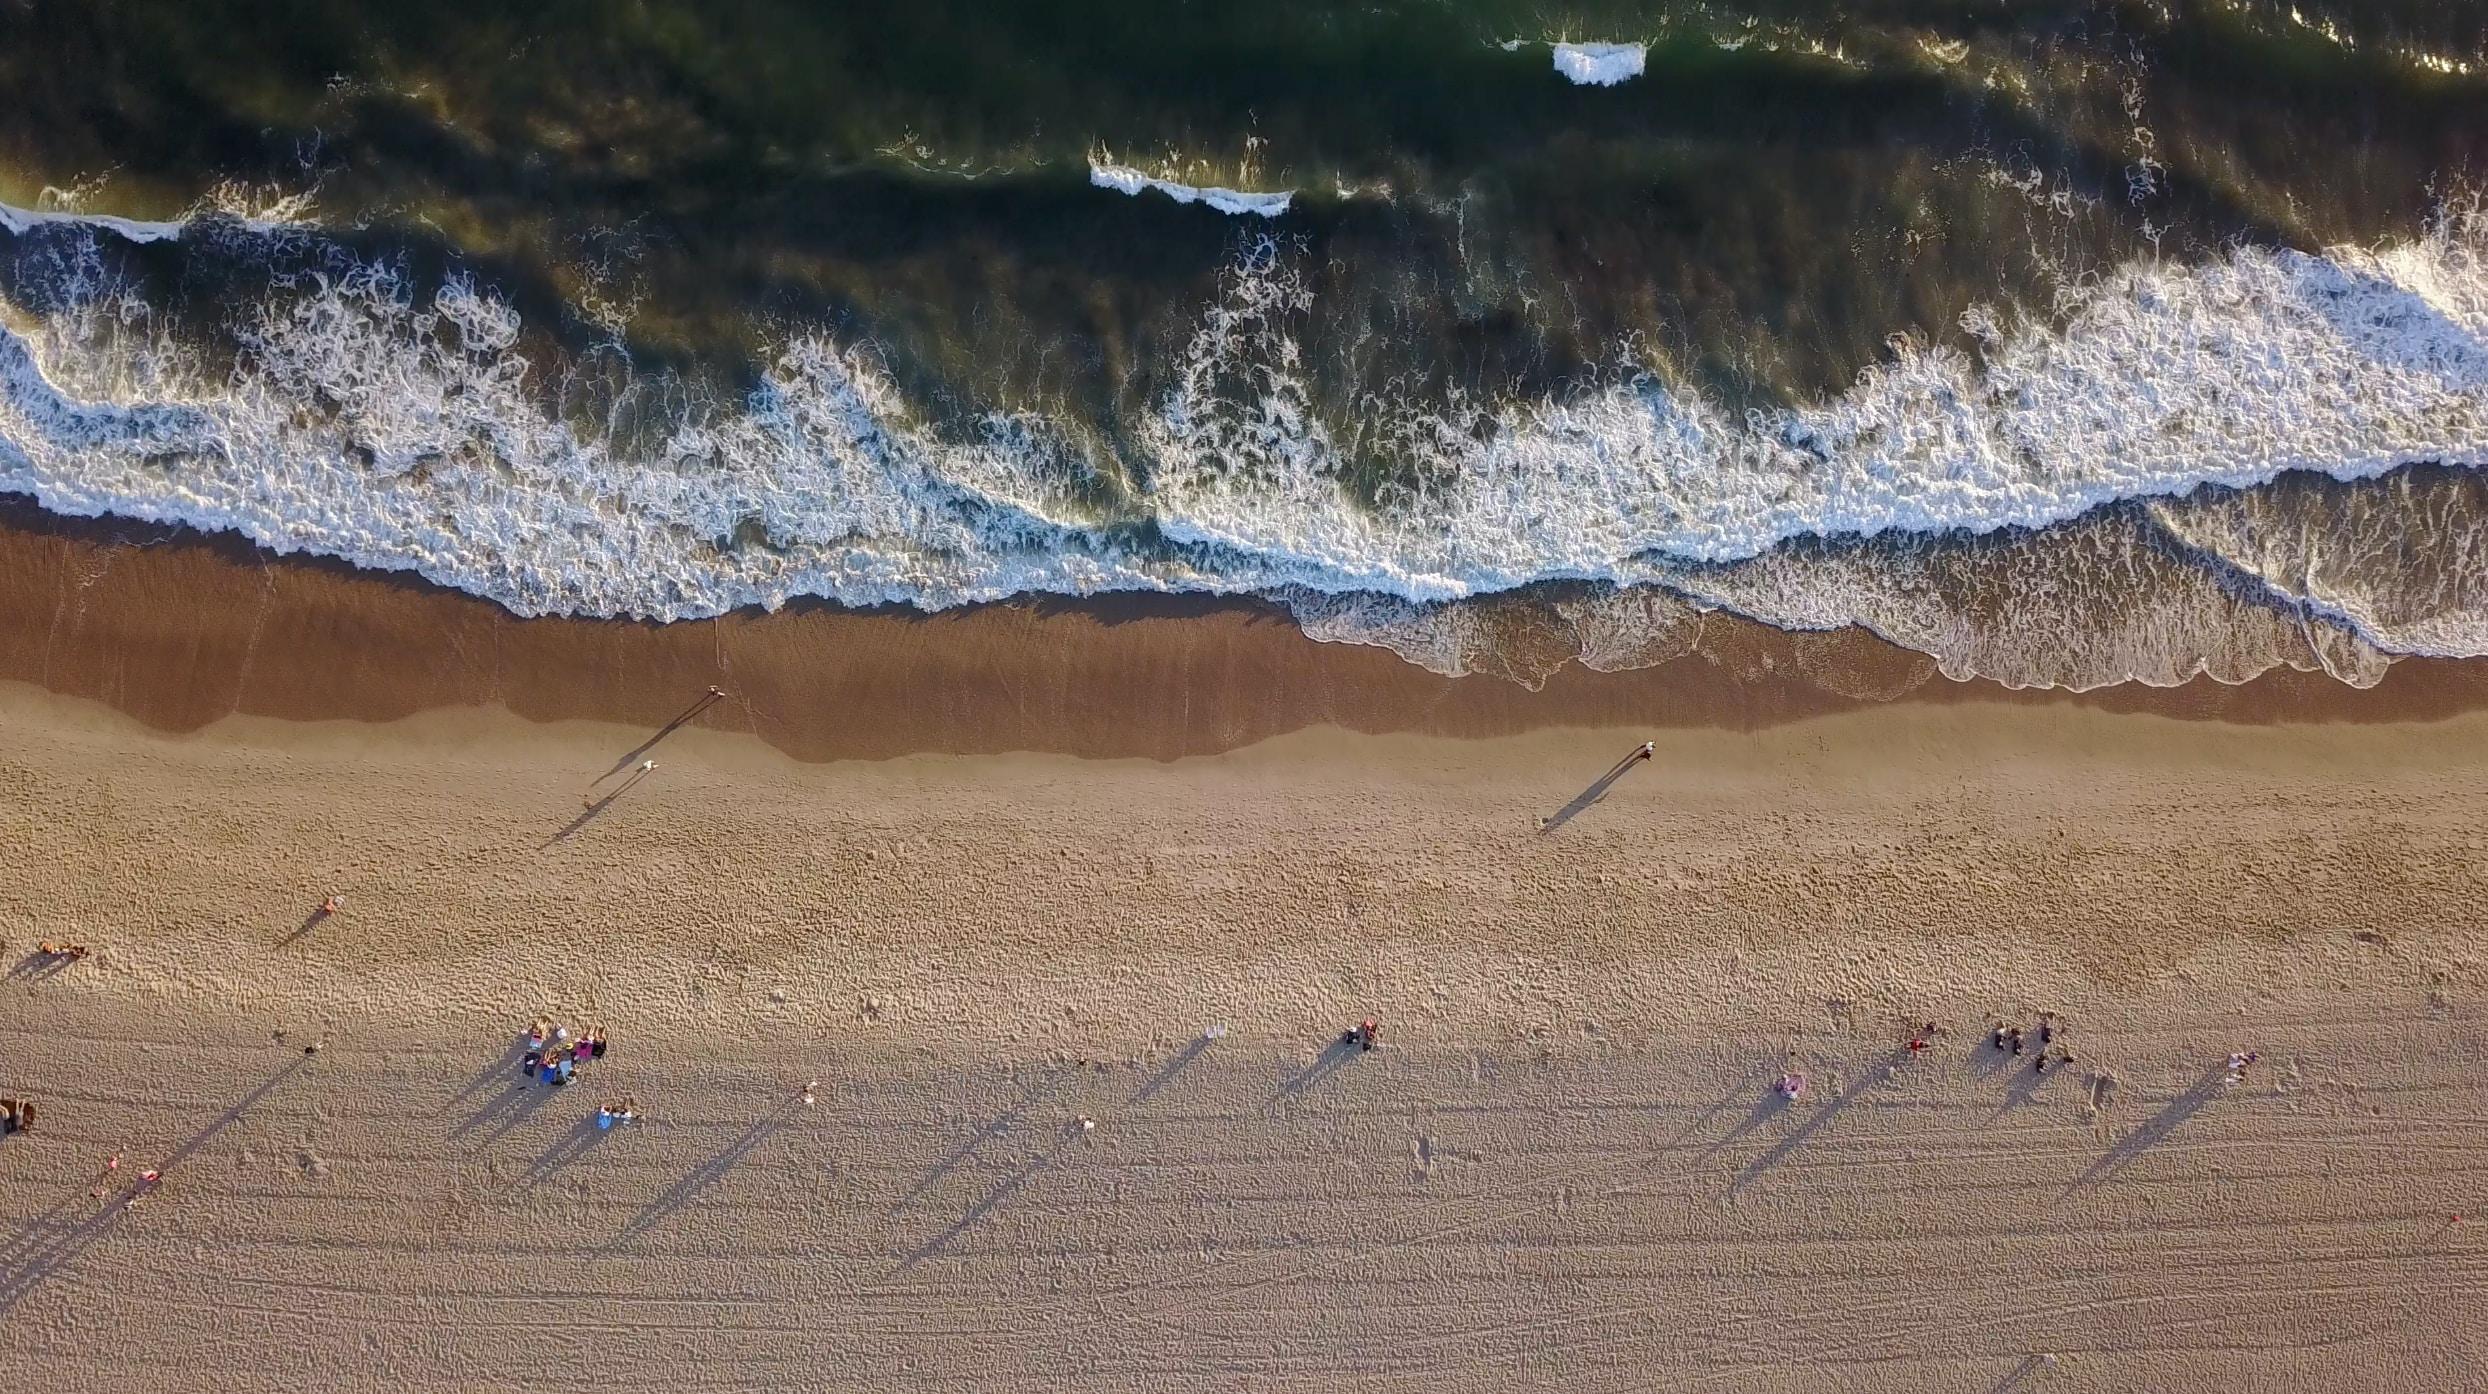 Drone view of people on the sandy Venice Beach coastline